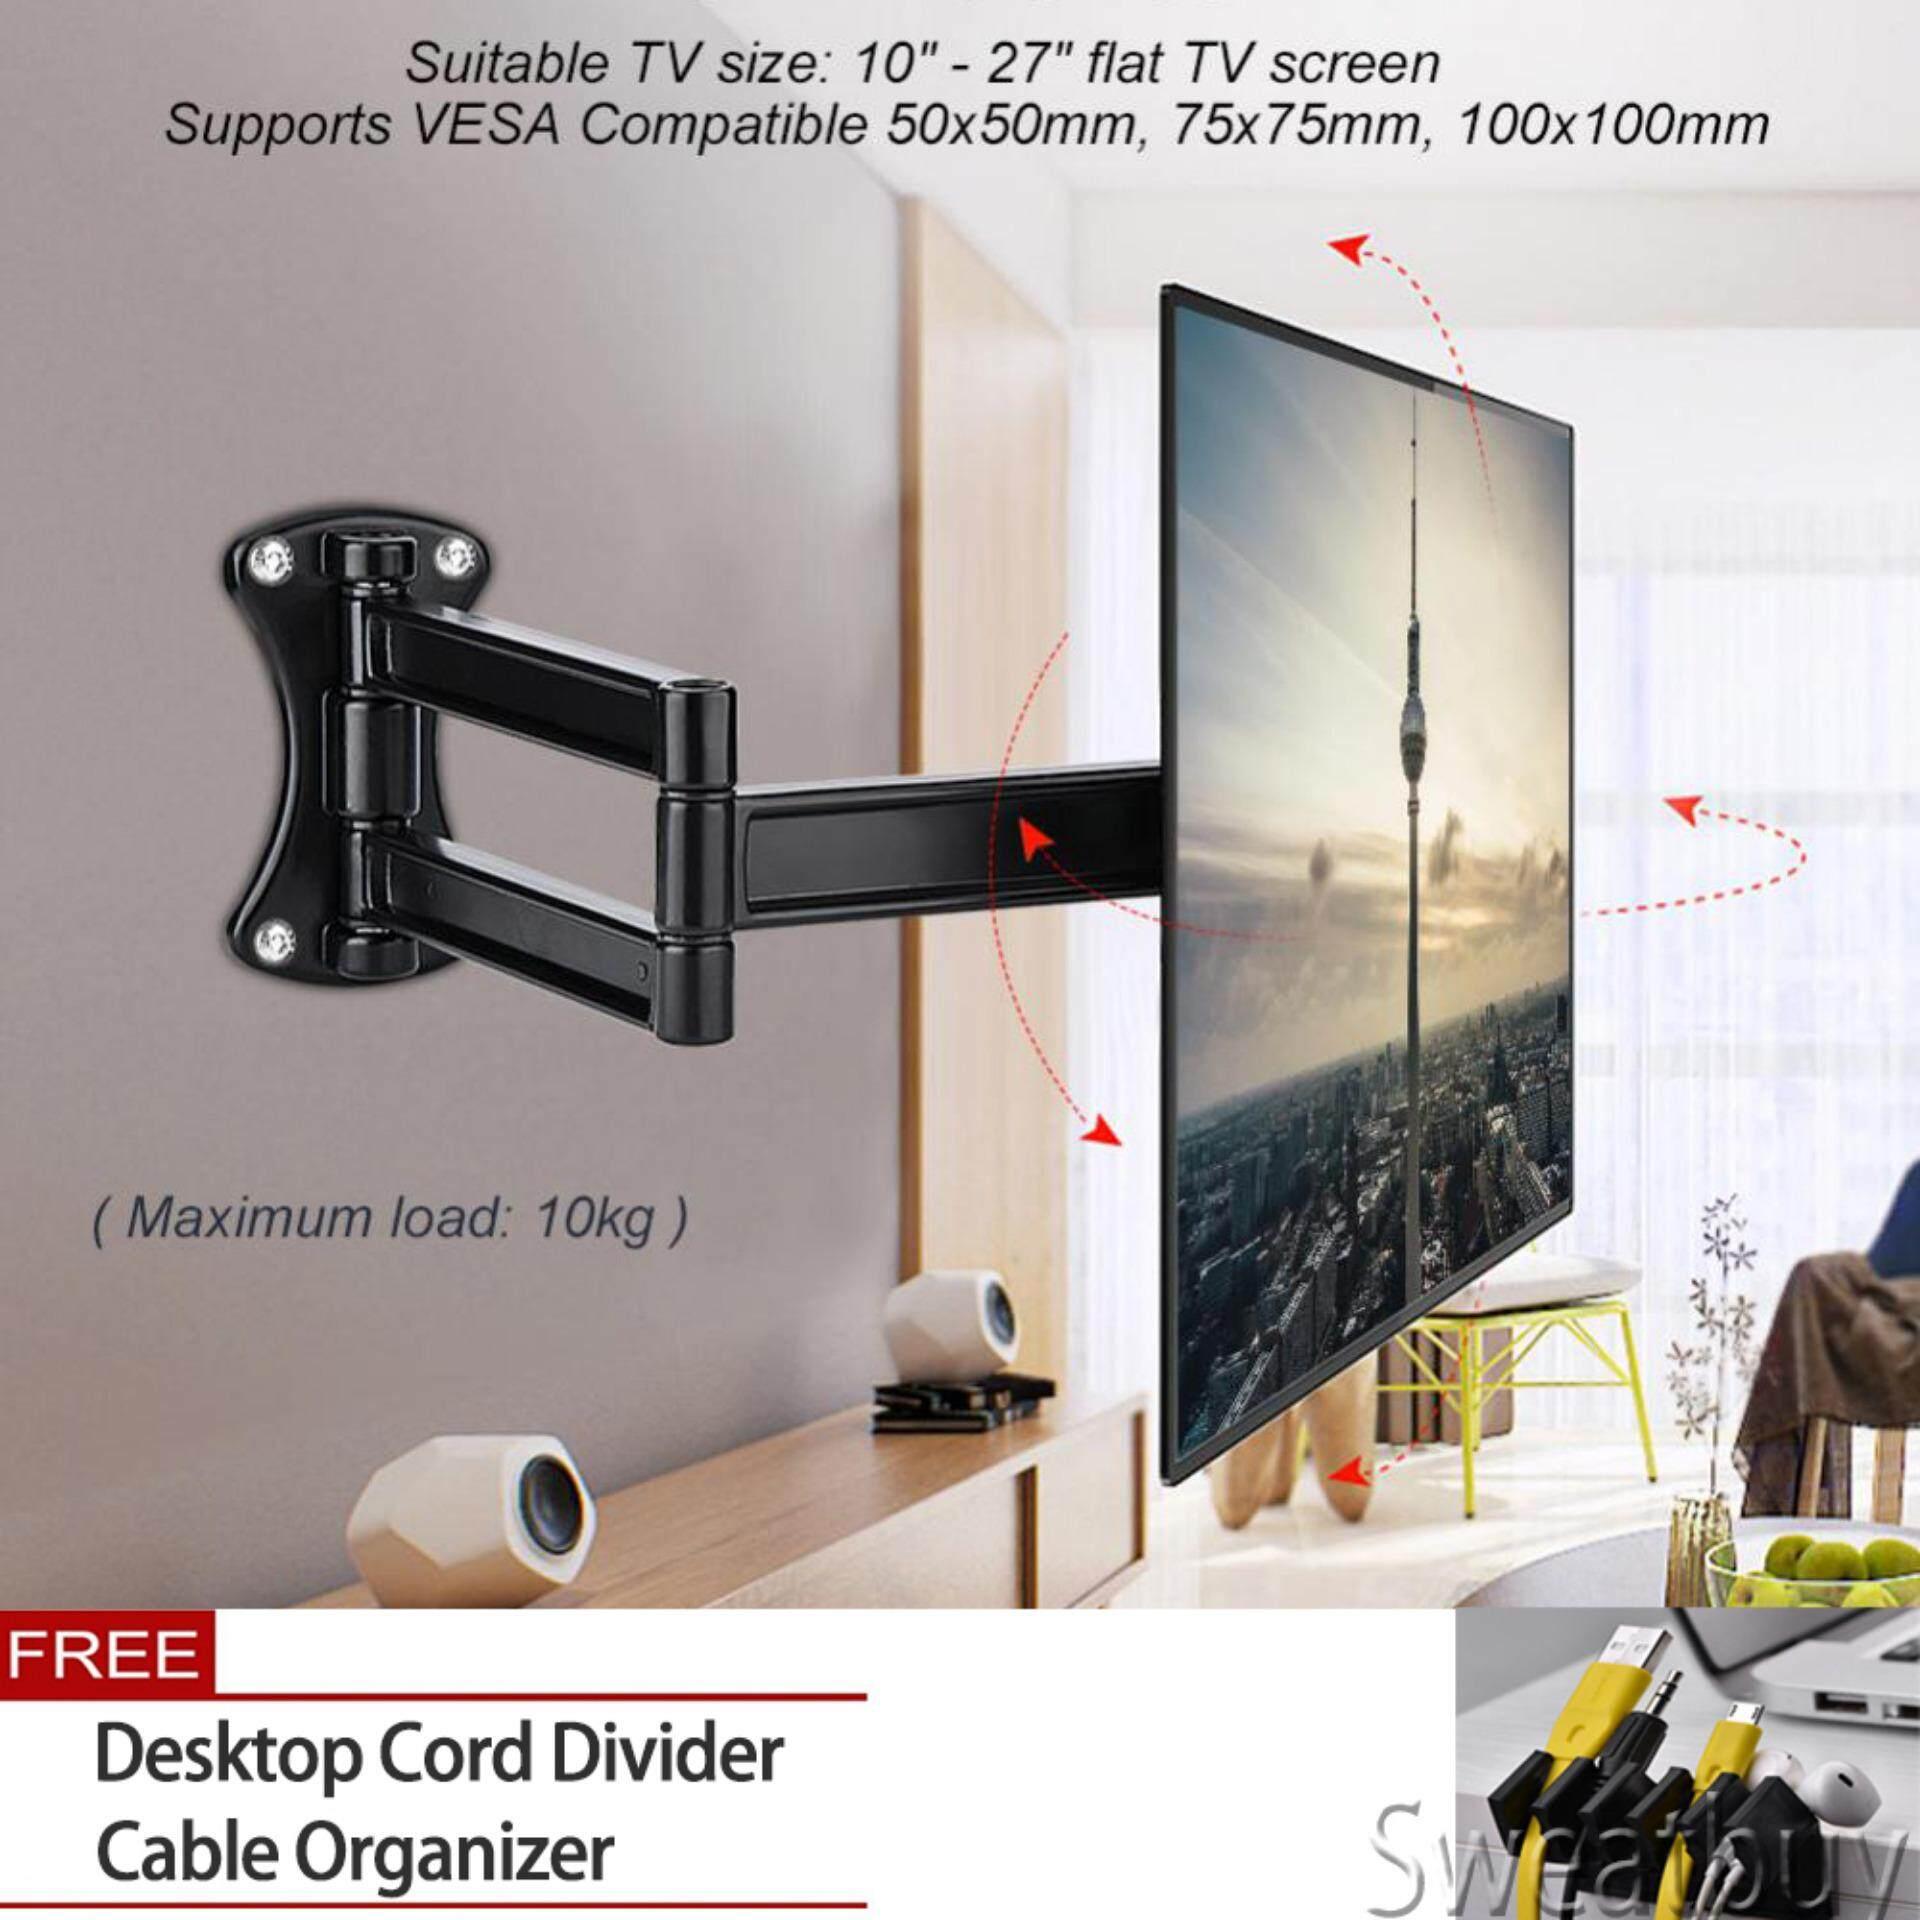 【Buy 1 Get 1 Free Gift】Tv Mount Wall Bracket Tilting Swivel Mount Stand Holder for 10-27 Inch Flat TV LED LCD Screen - intl